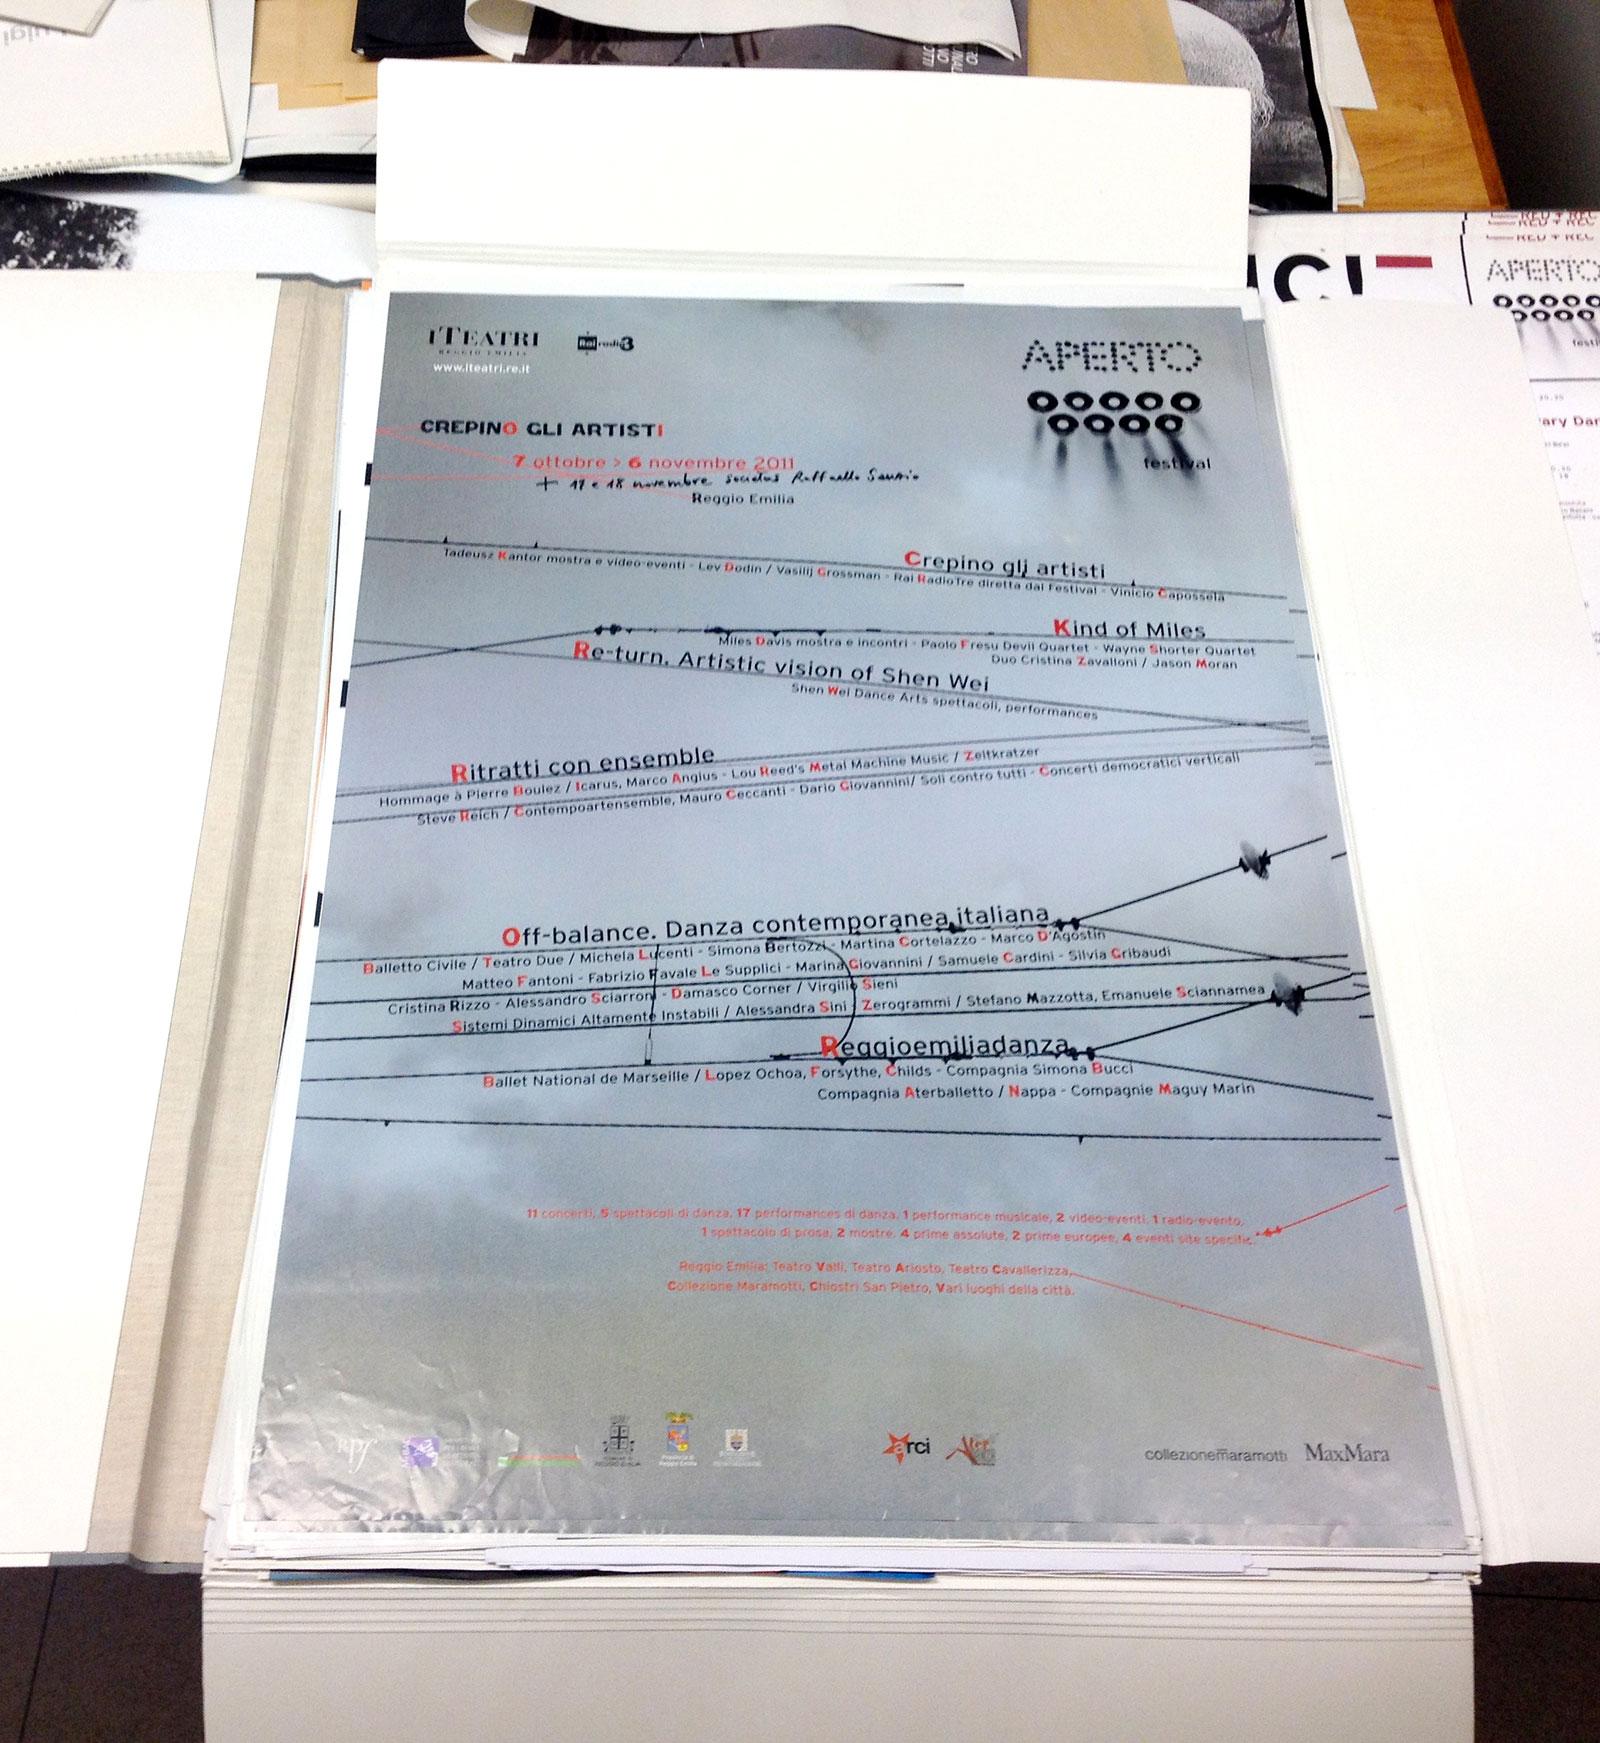 I-TEATRI-aperto-2011-manifesto